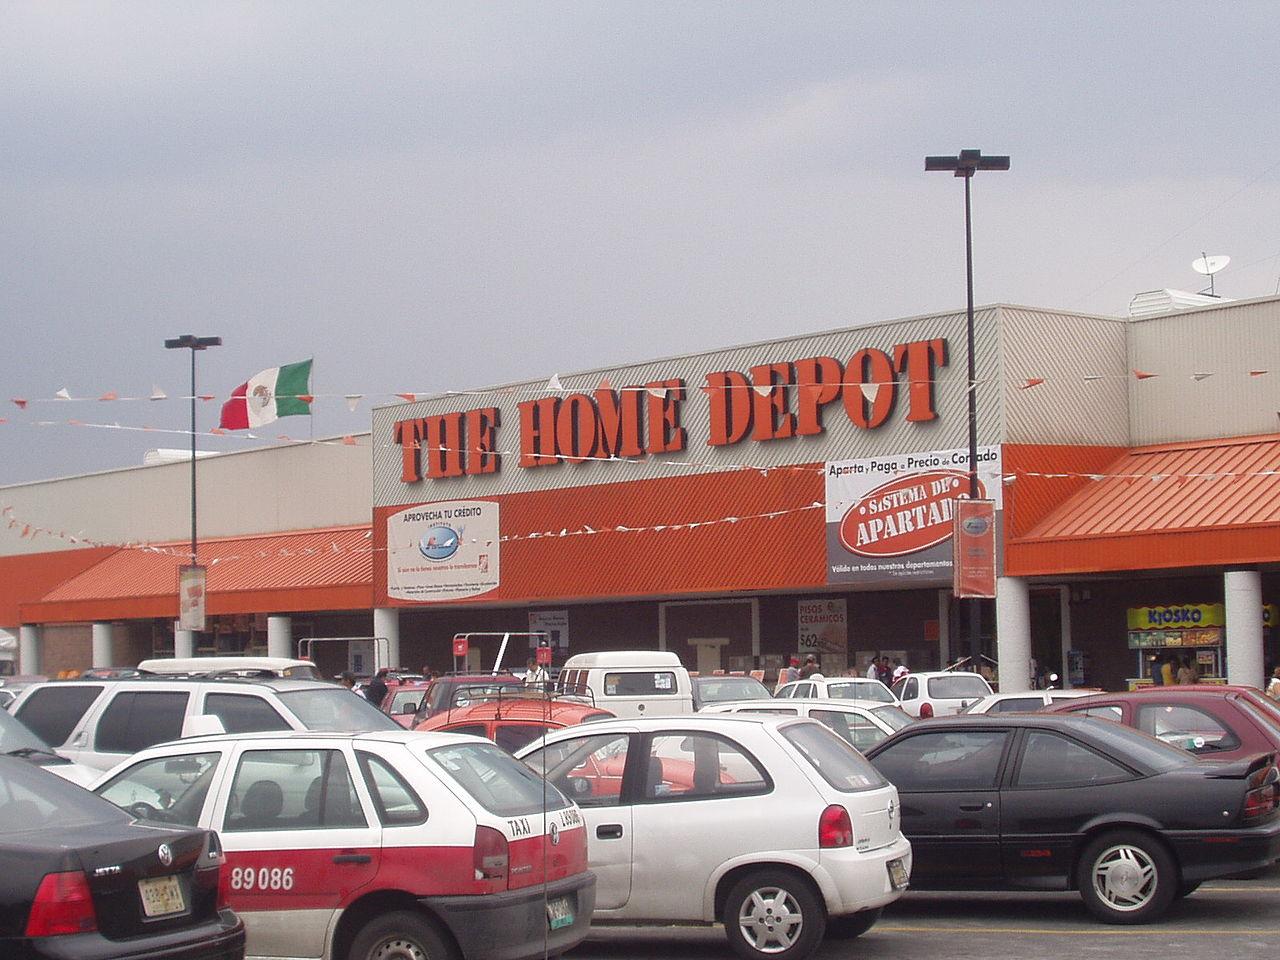 Crece la presencia de The Home Depot en Aguascalientes